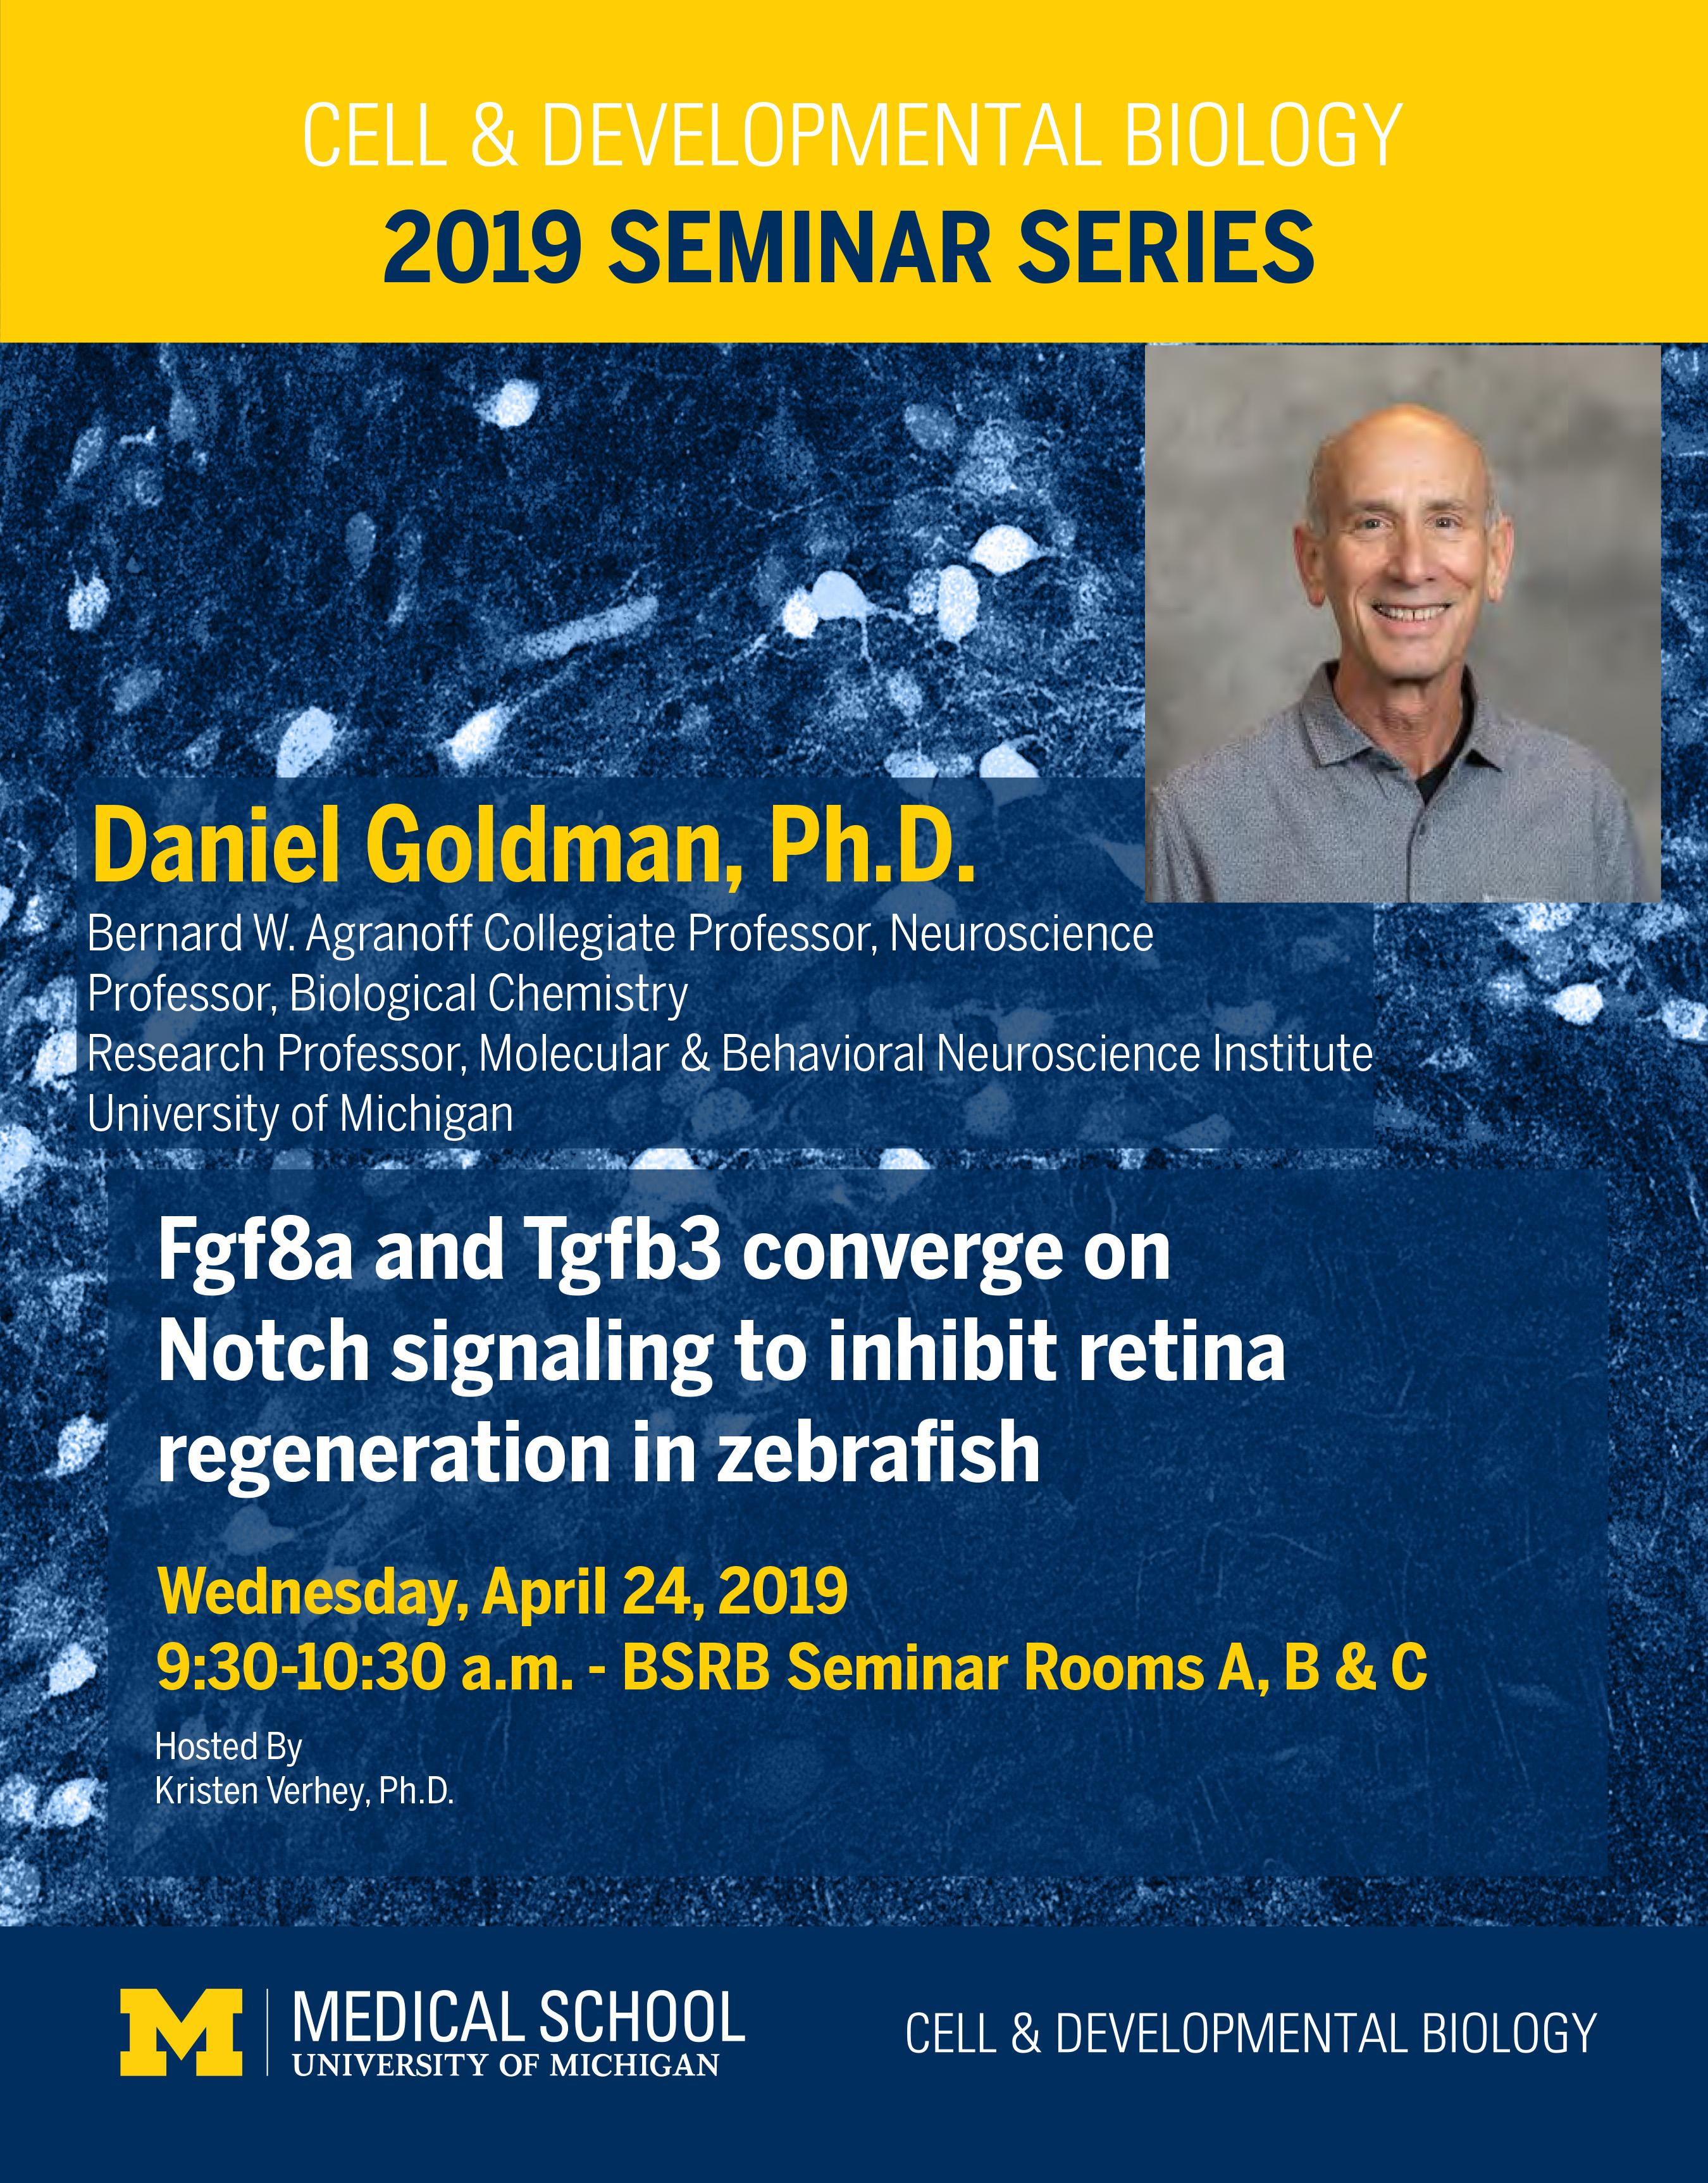 Goldman 2019 Seminar